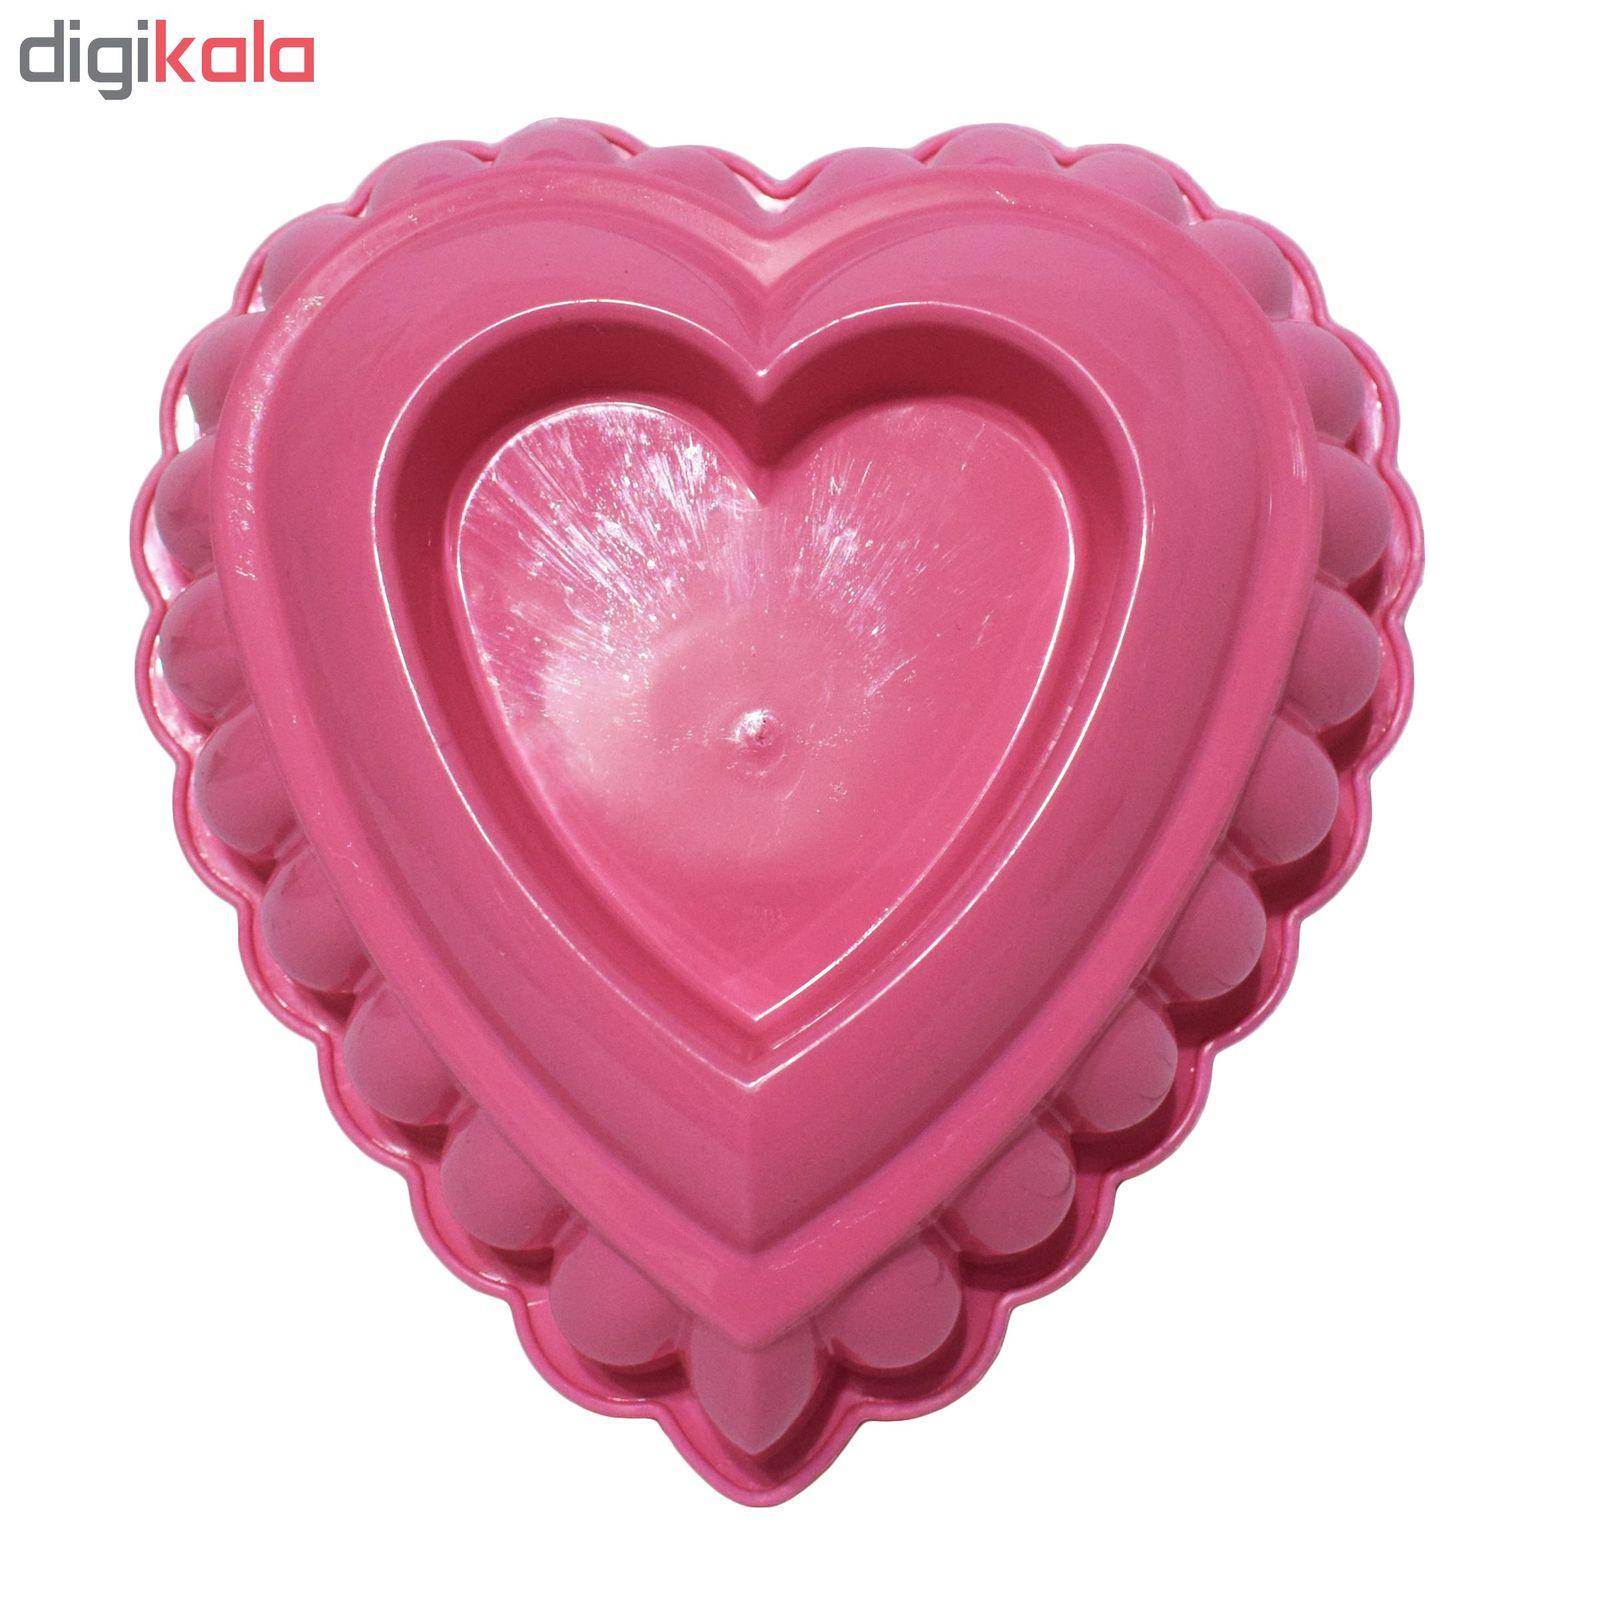 قالب ژله طرح قلب کد 001 main 1 2